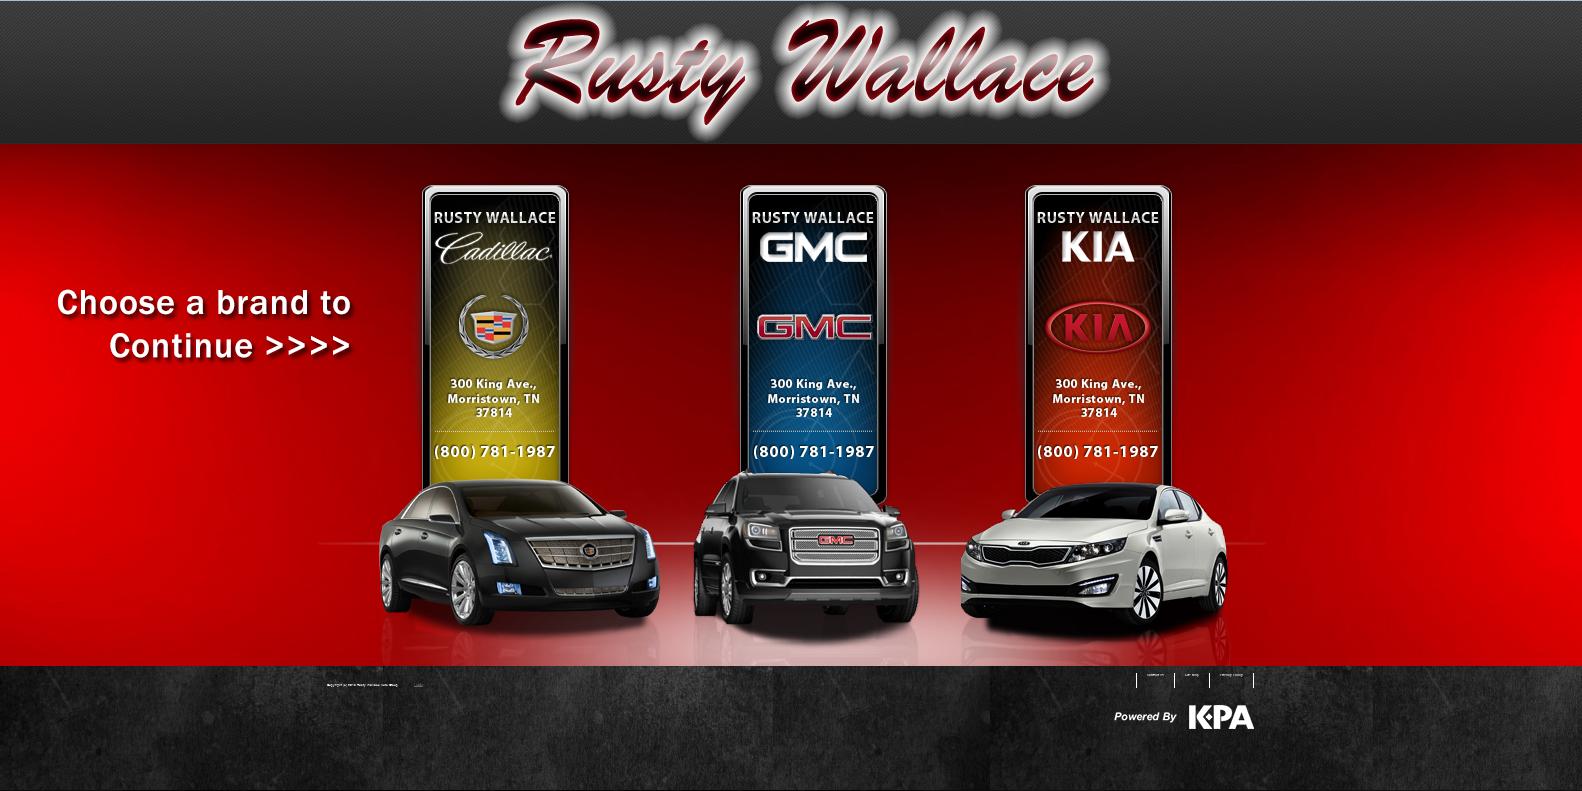 Rusty wallace cadillac gmc kia new used car dealer morristown tn used car dealership johnson city